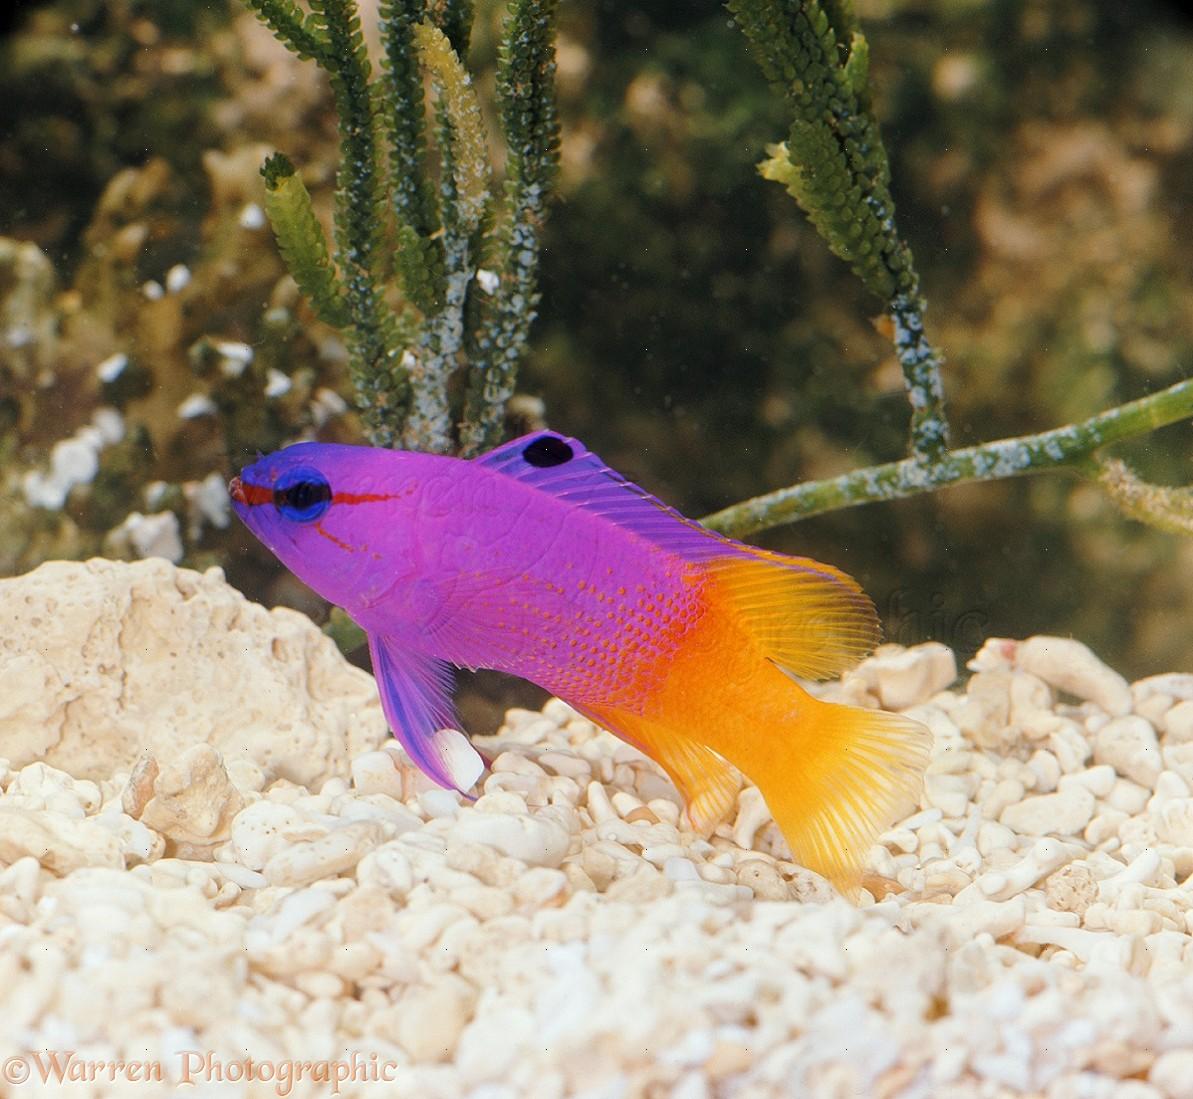 08367-Royal-Gramma-fish.jpg